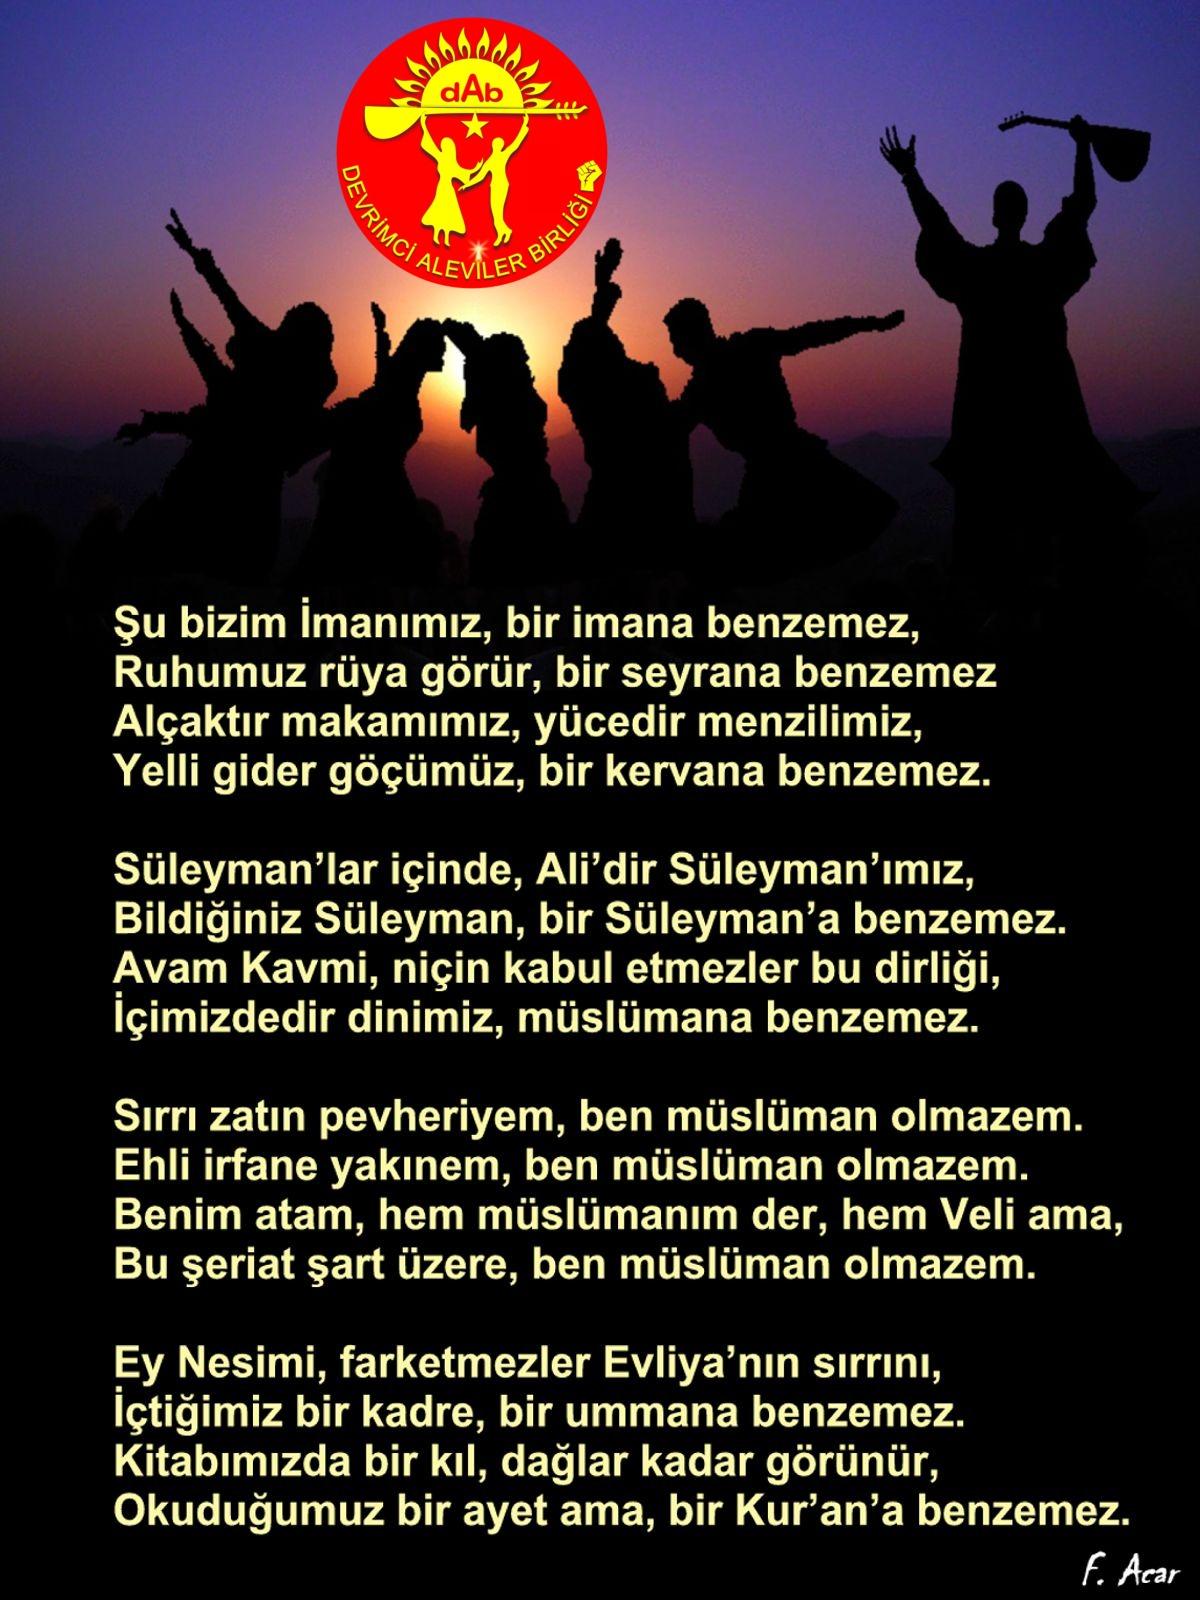 Alevi Bektaşi Kızılbaş Pir Sultan Devrimci Aleviler Birliği DAB benzemez